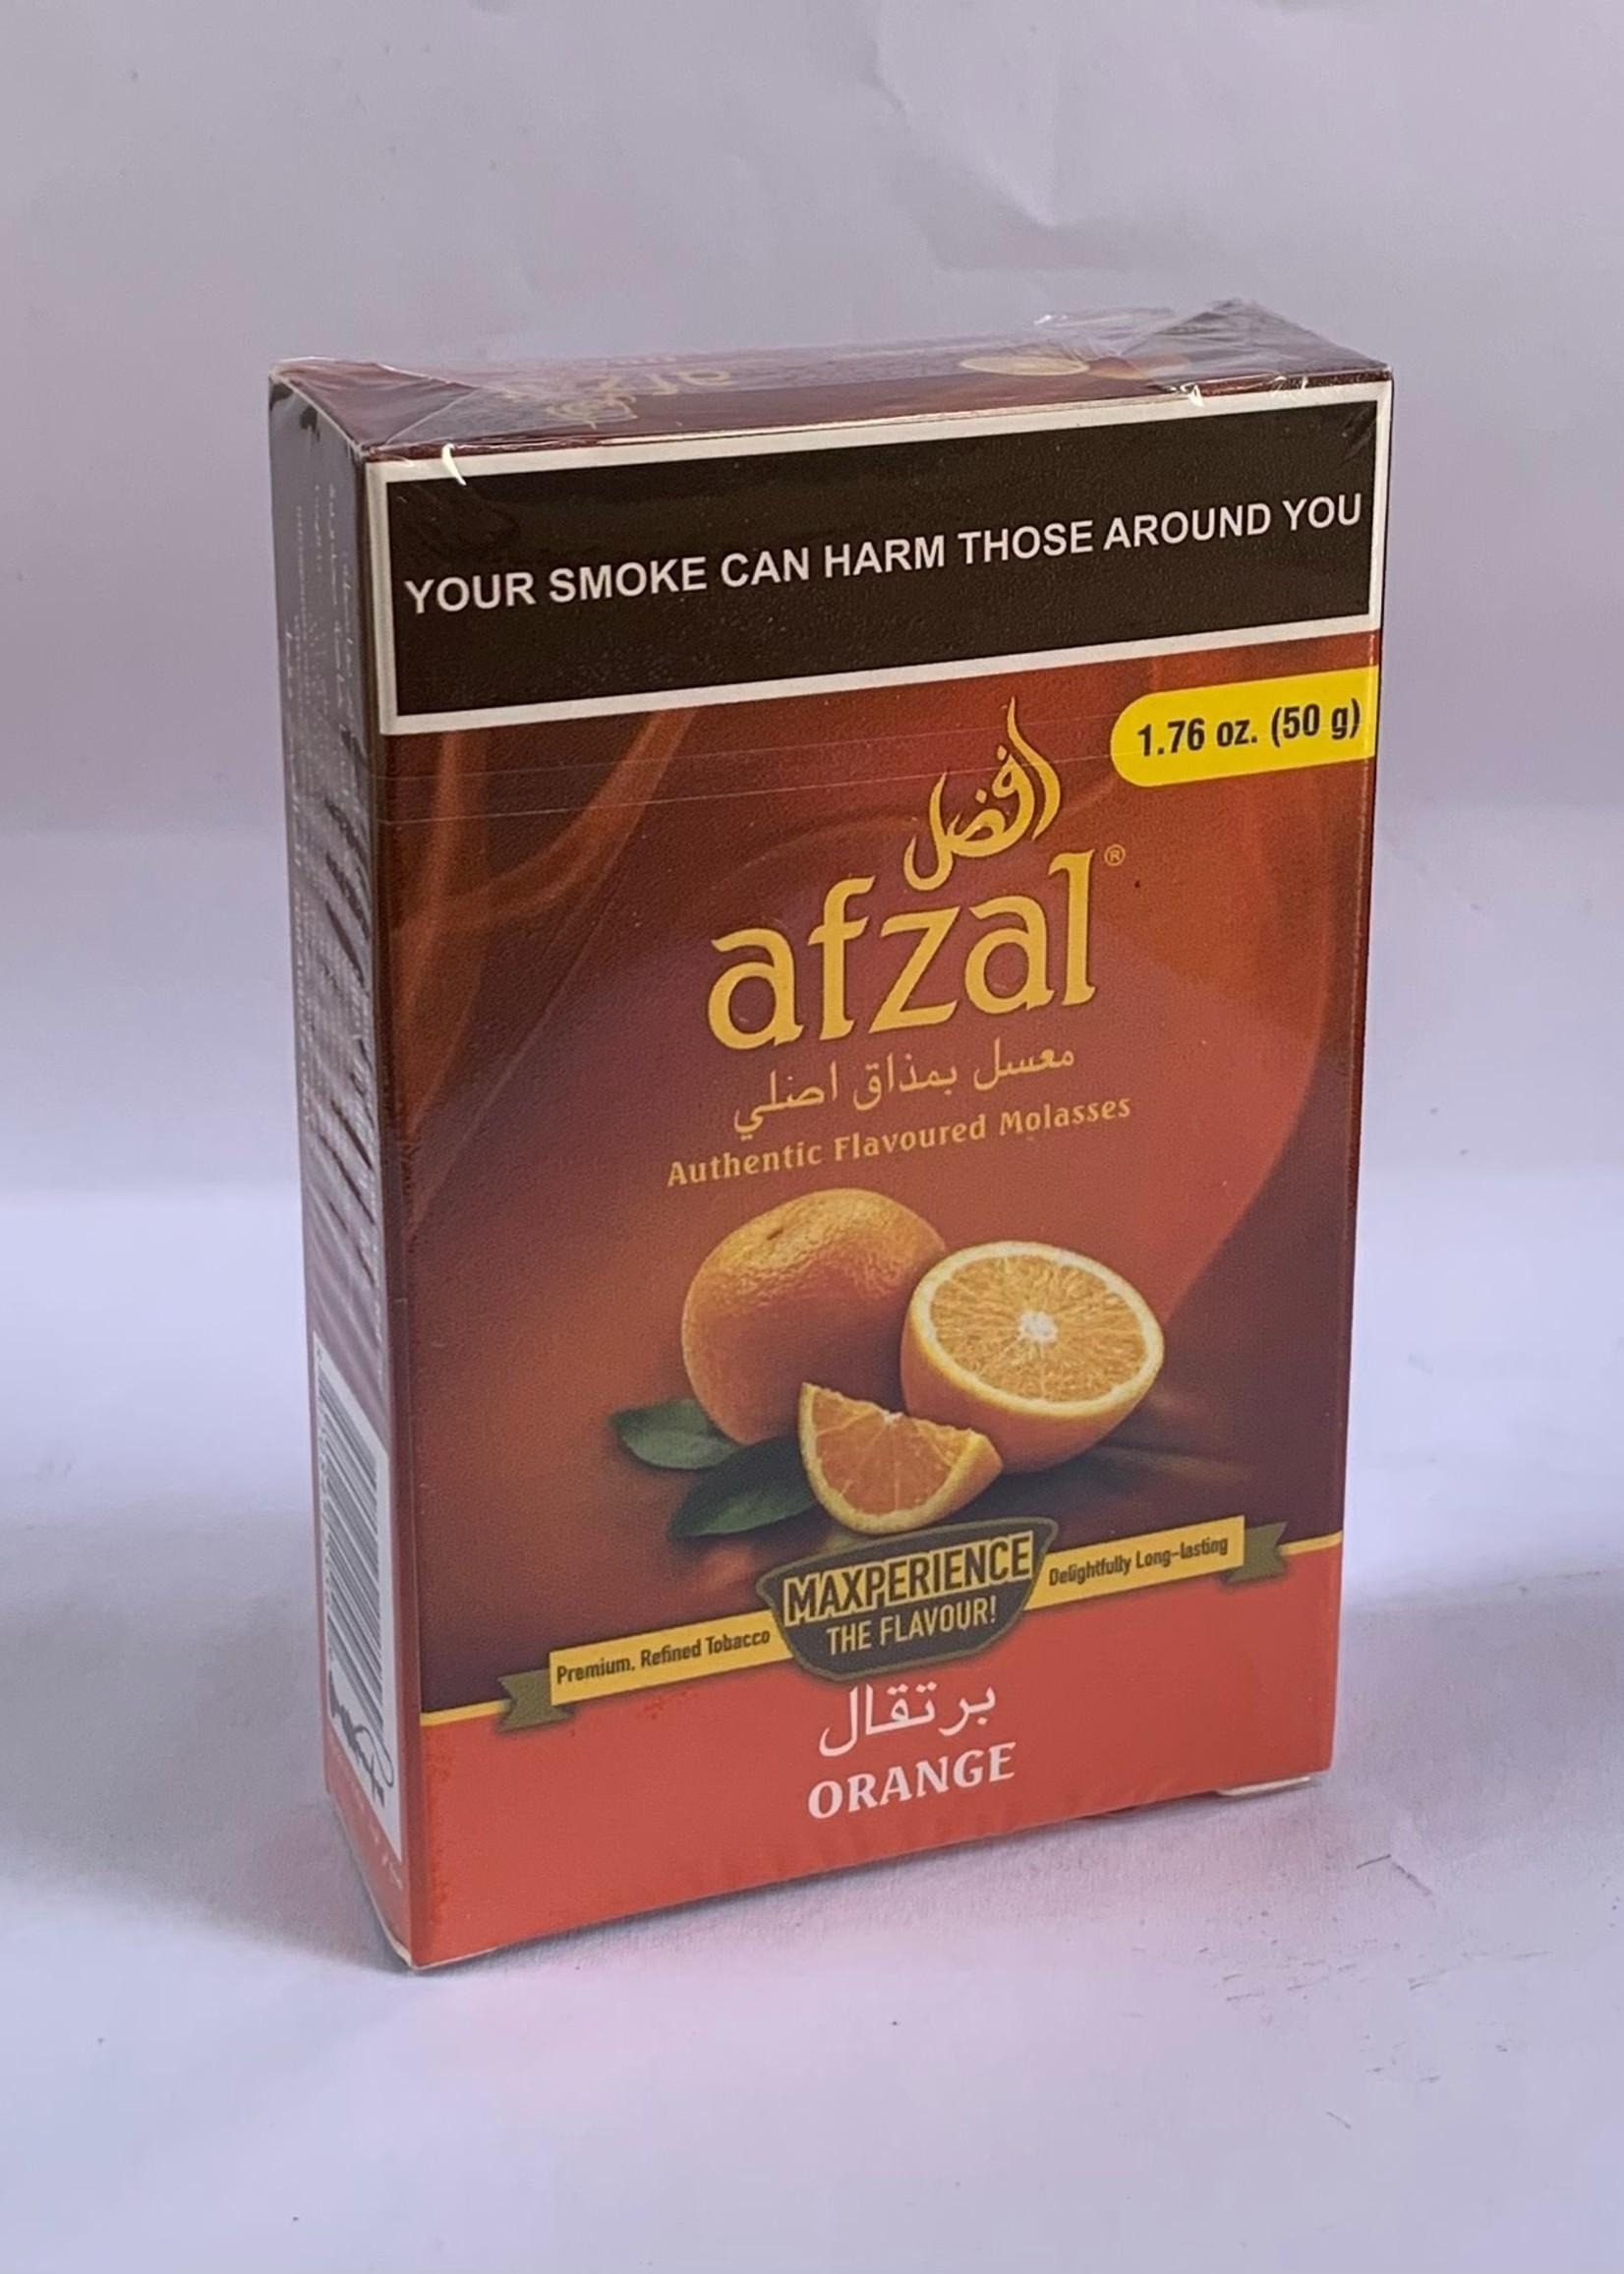 Afzal hubbly flavour - orange